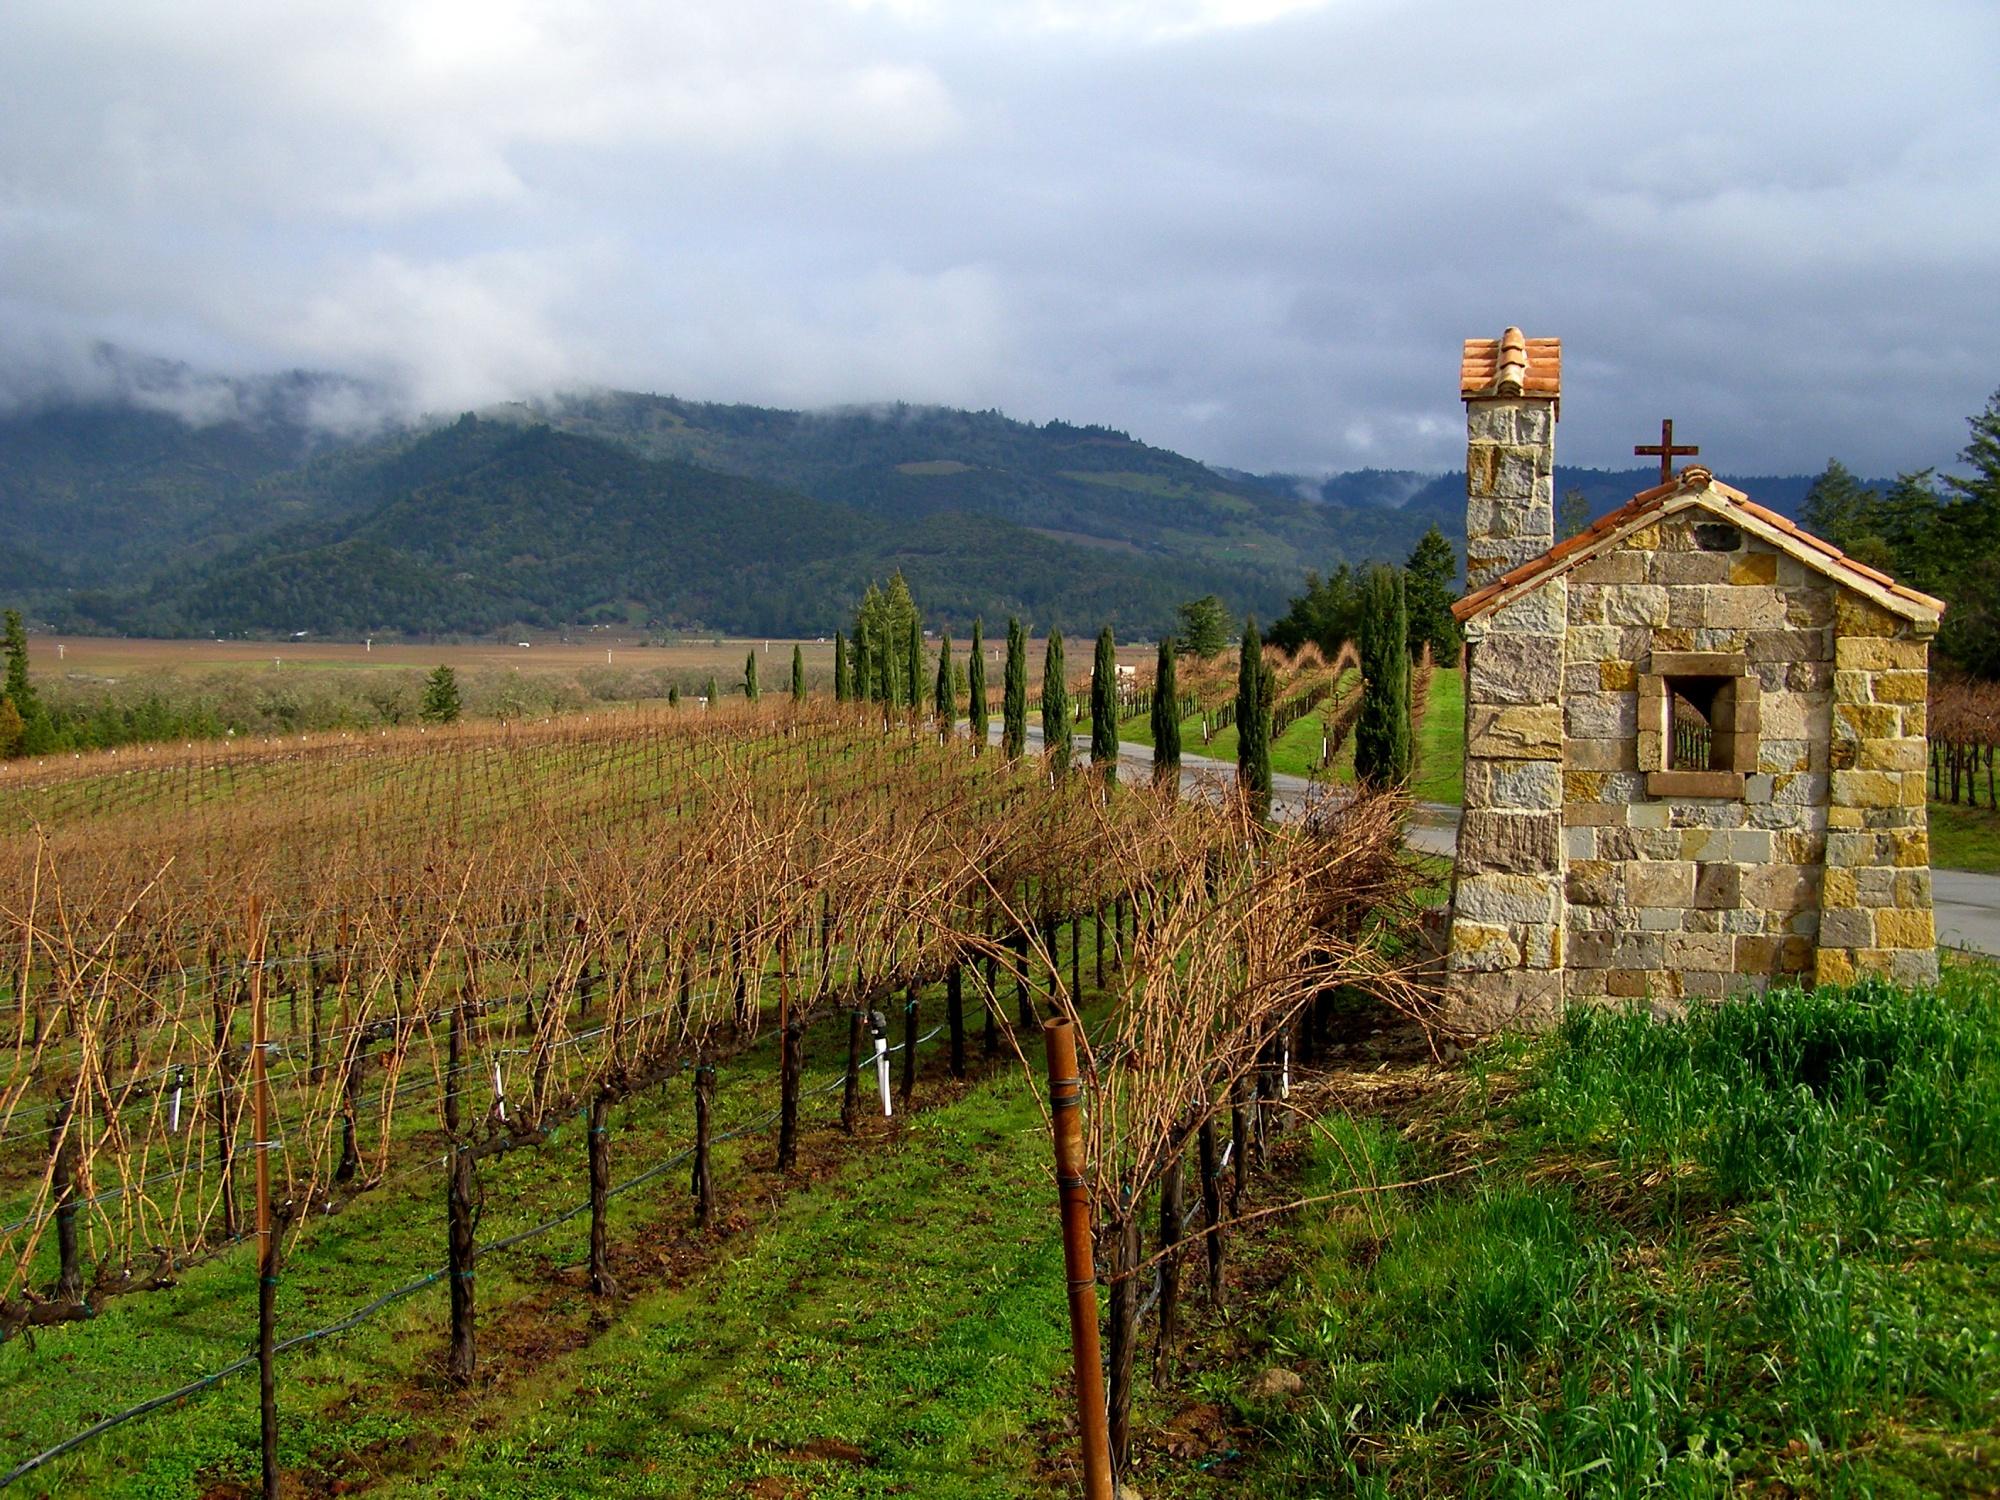 View of Napa Valley from the Gate House of Castello di Amorosa | Dawn Devine ~ davinadevine.me